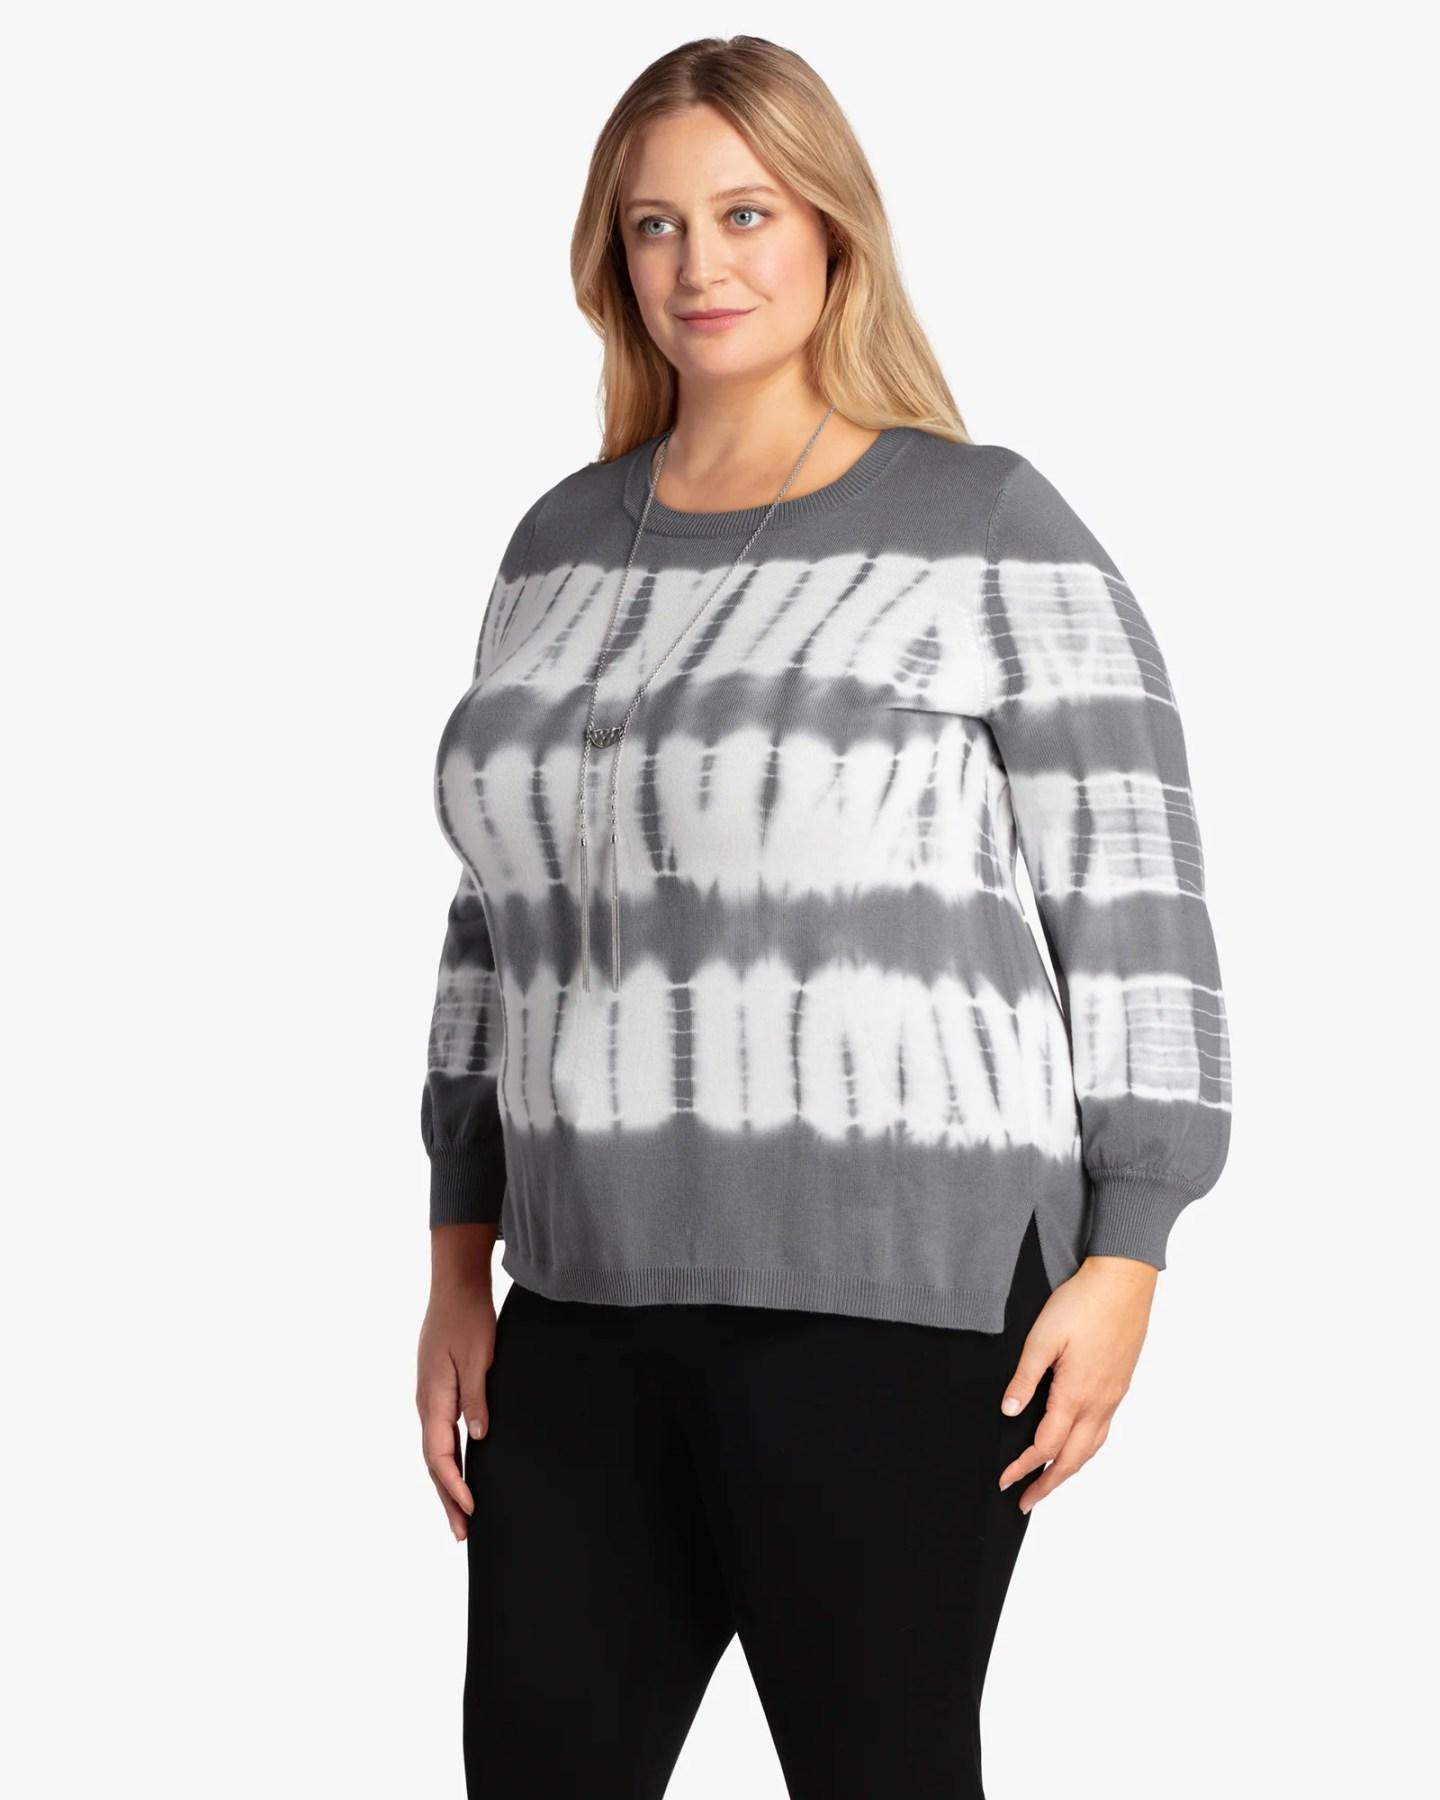 Single Thread Tie-Dye Long-Sleeve Crewneck - Charcoal Grey / White, Size 2X (18-20), Dia&Co